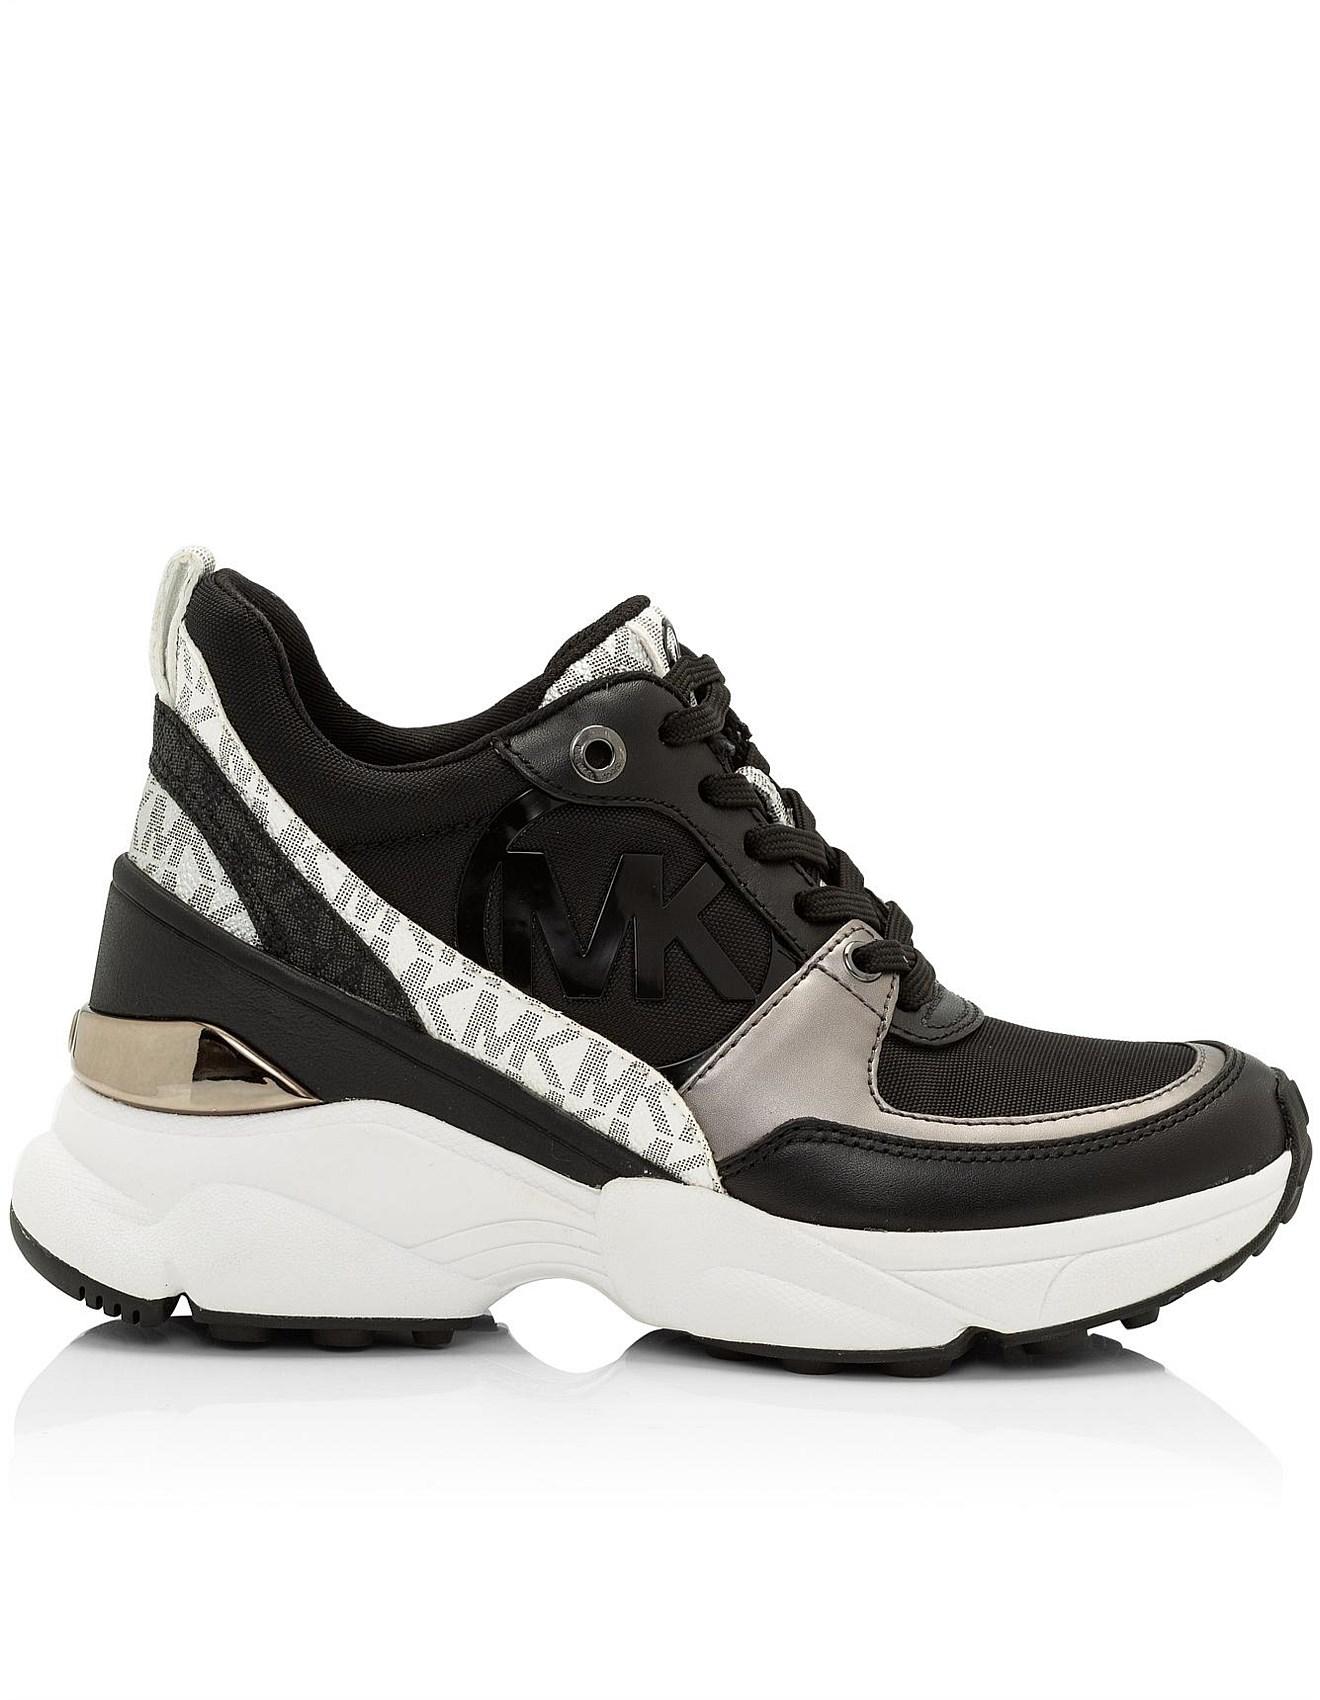 michael kors sneakers david jones